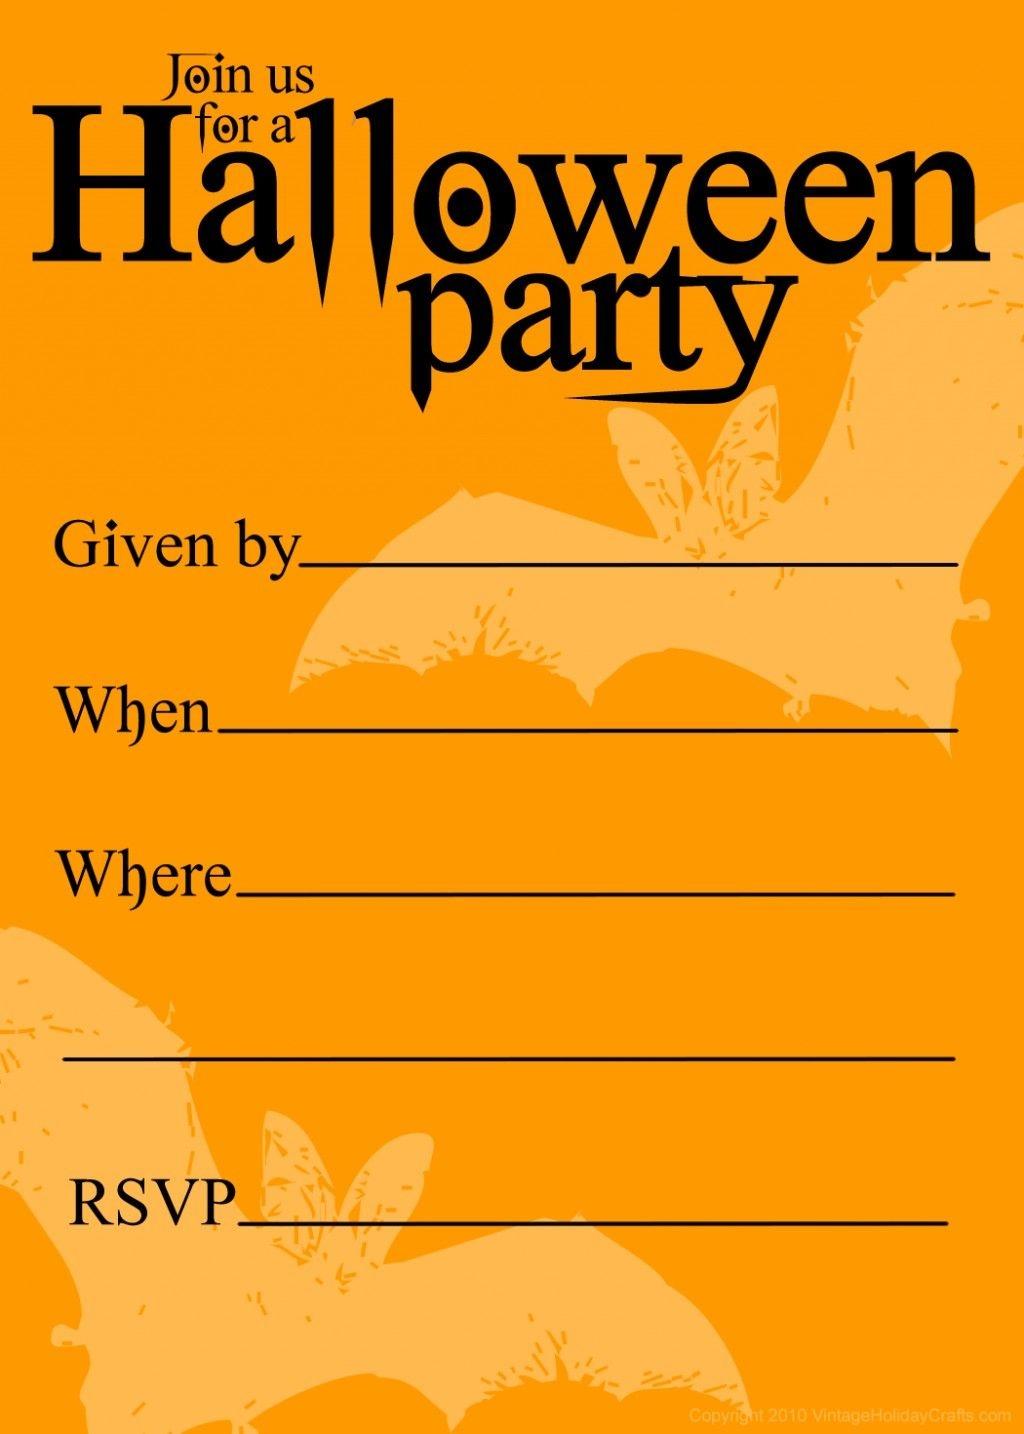 Free Printable Halloween Birthday Invitations Templates   Halloween - Free Printable Halloween Party Invitations